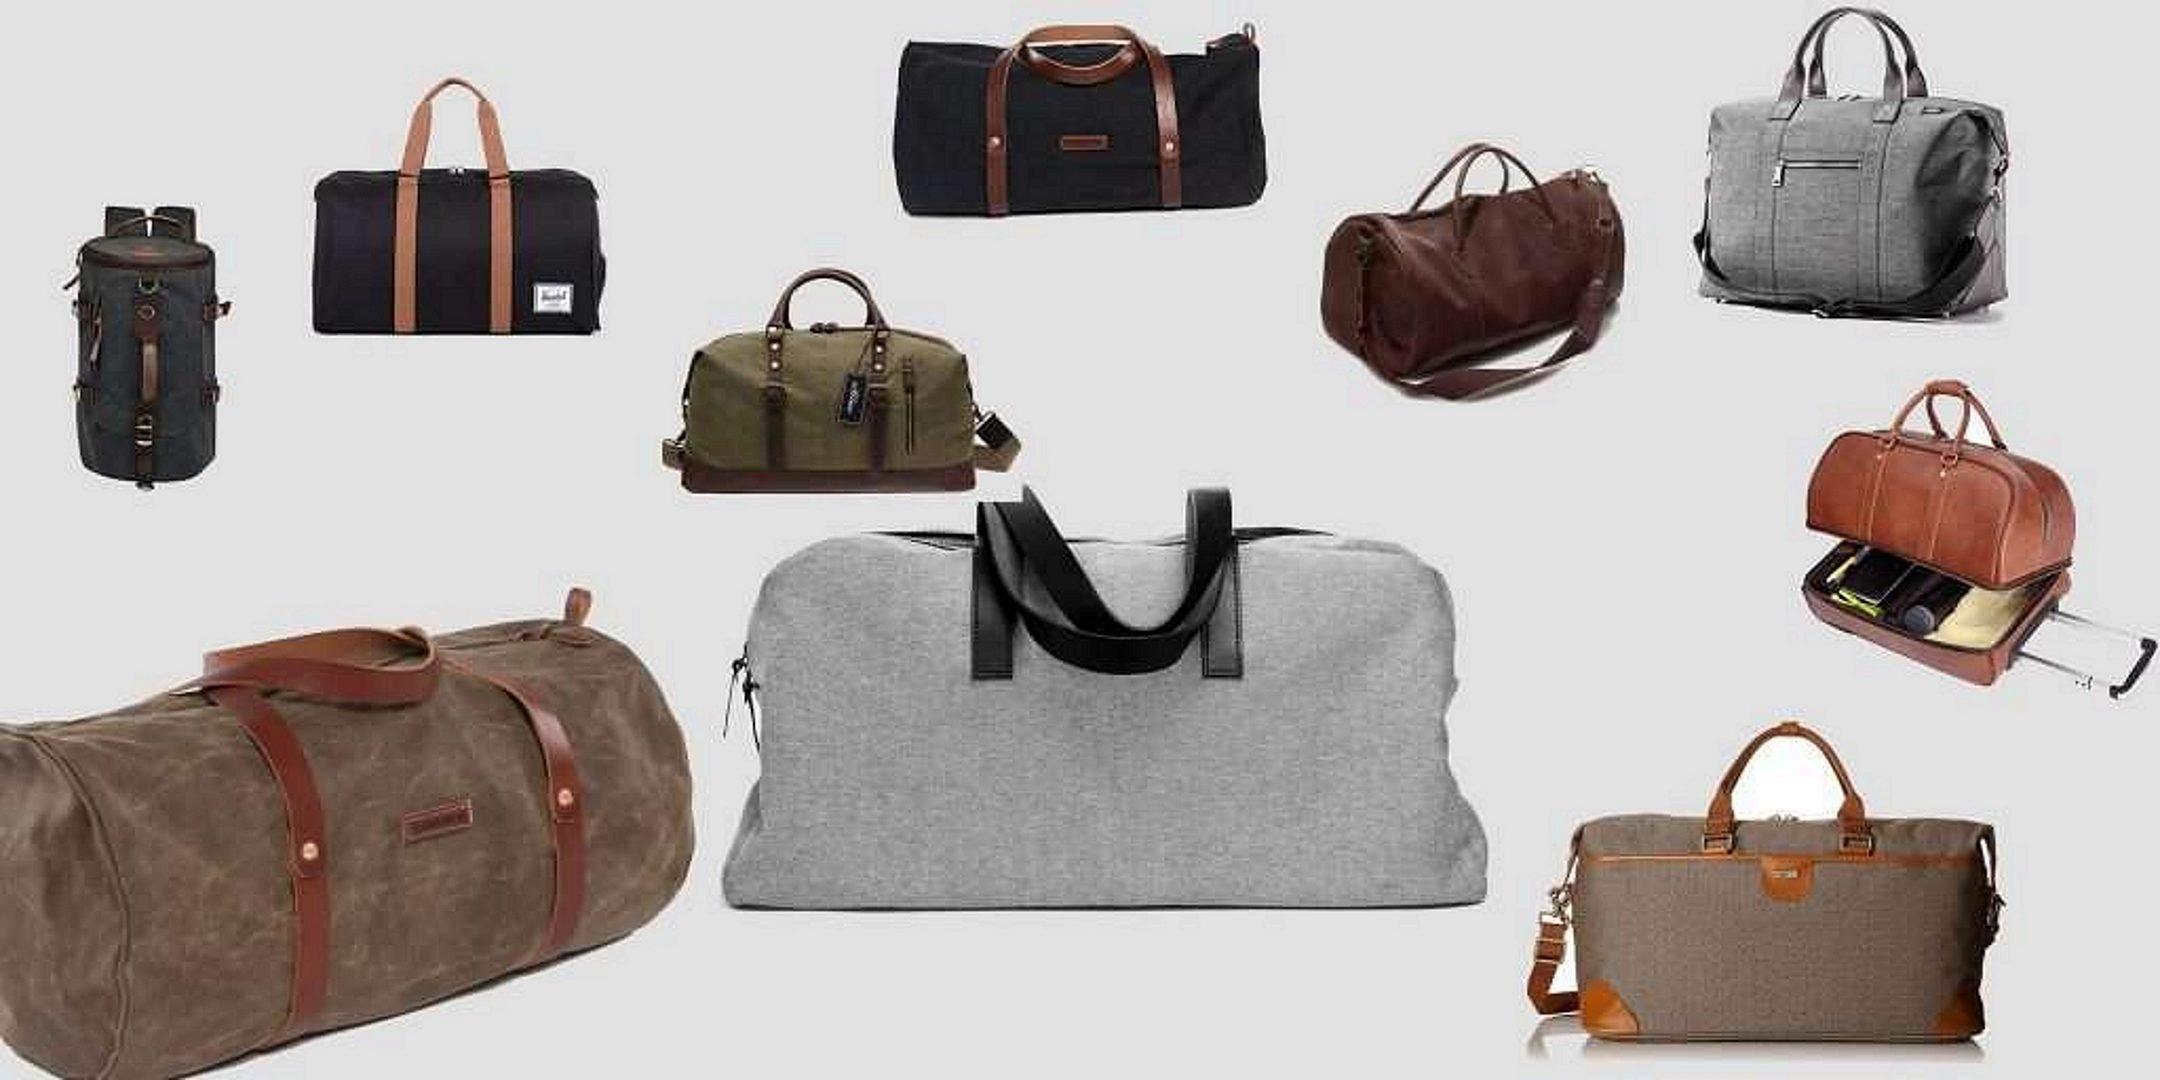 Best Duffel Bag for International Travel